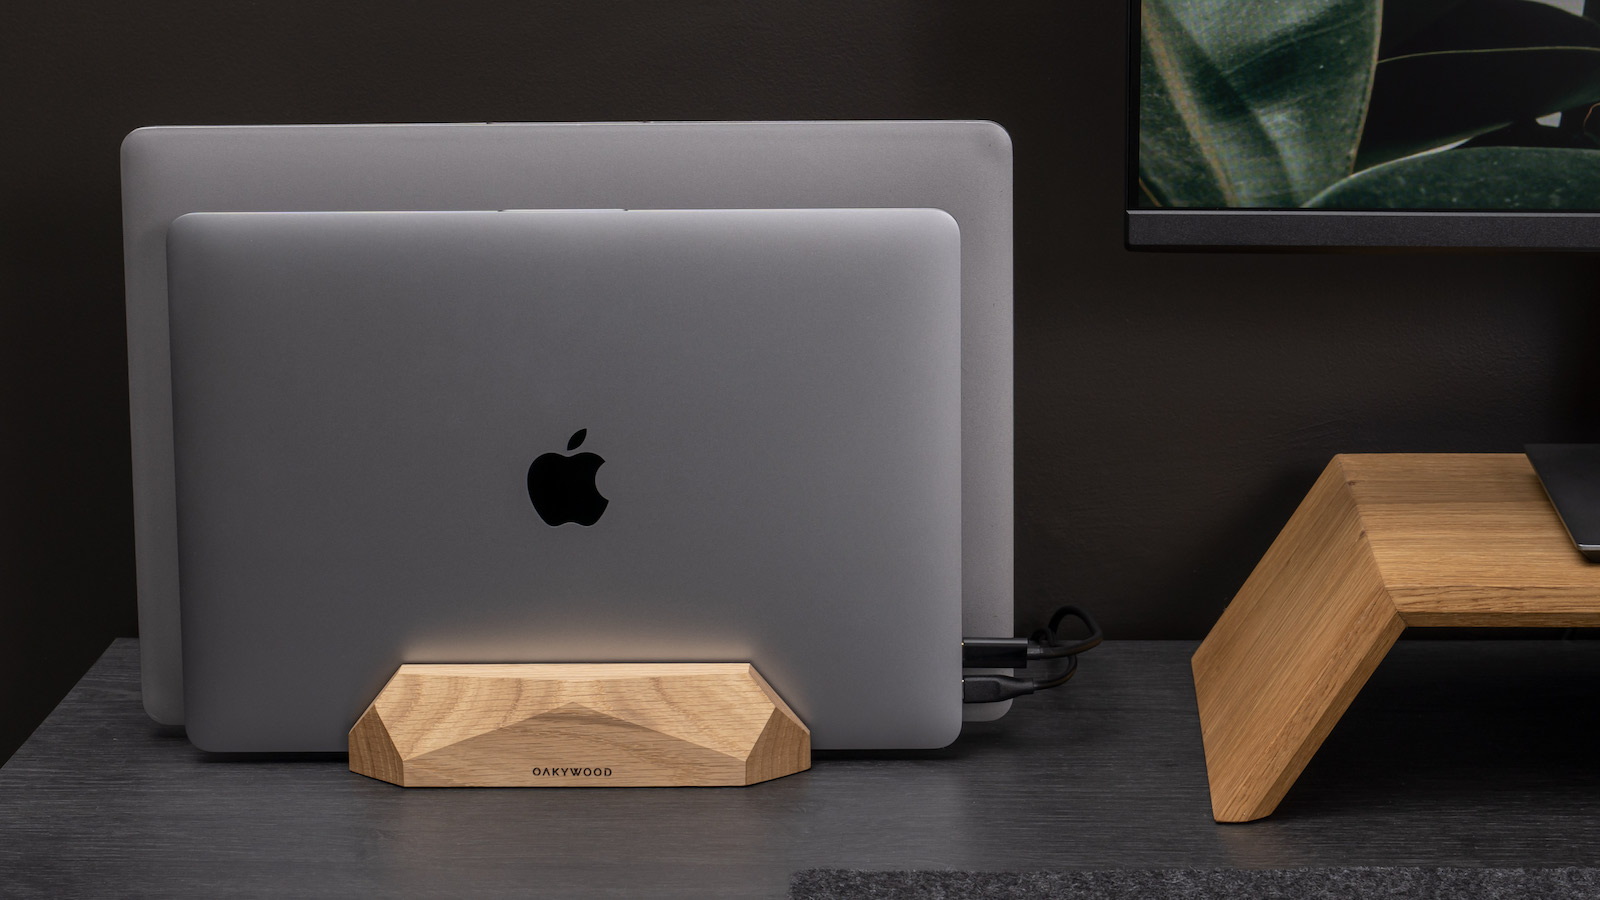 Oakywood-Dual-Vertical-Wood-Laptop-Stand-01.jpg